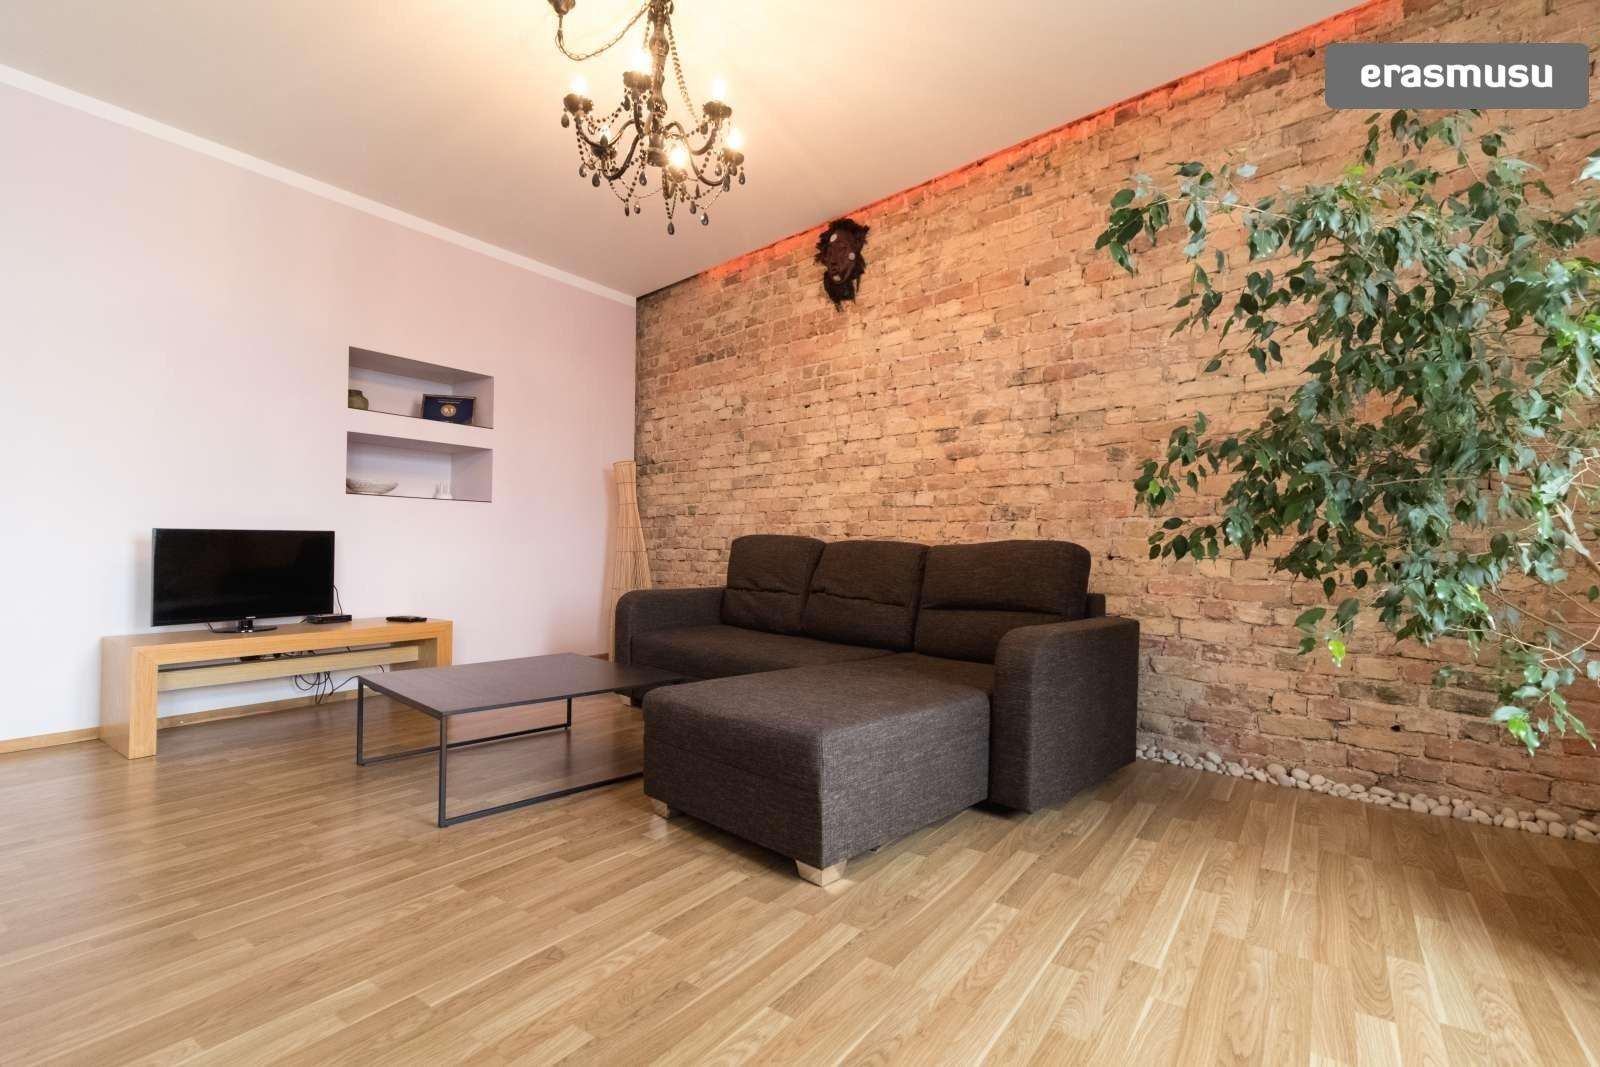 stylish-2-bedroom-apartment-rent-maskavas-forstate-9cc4380b497af